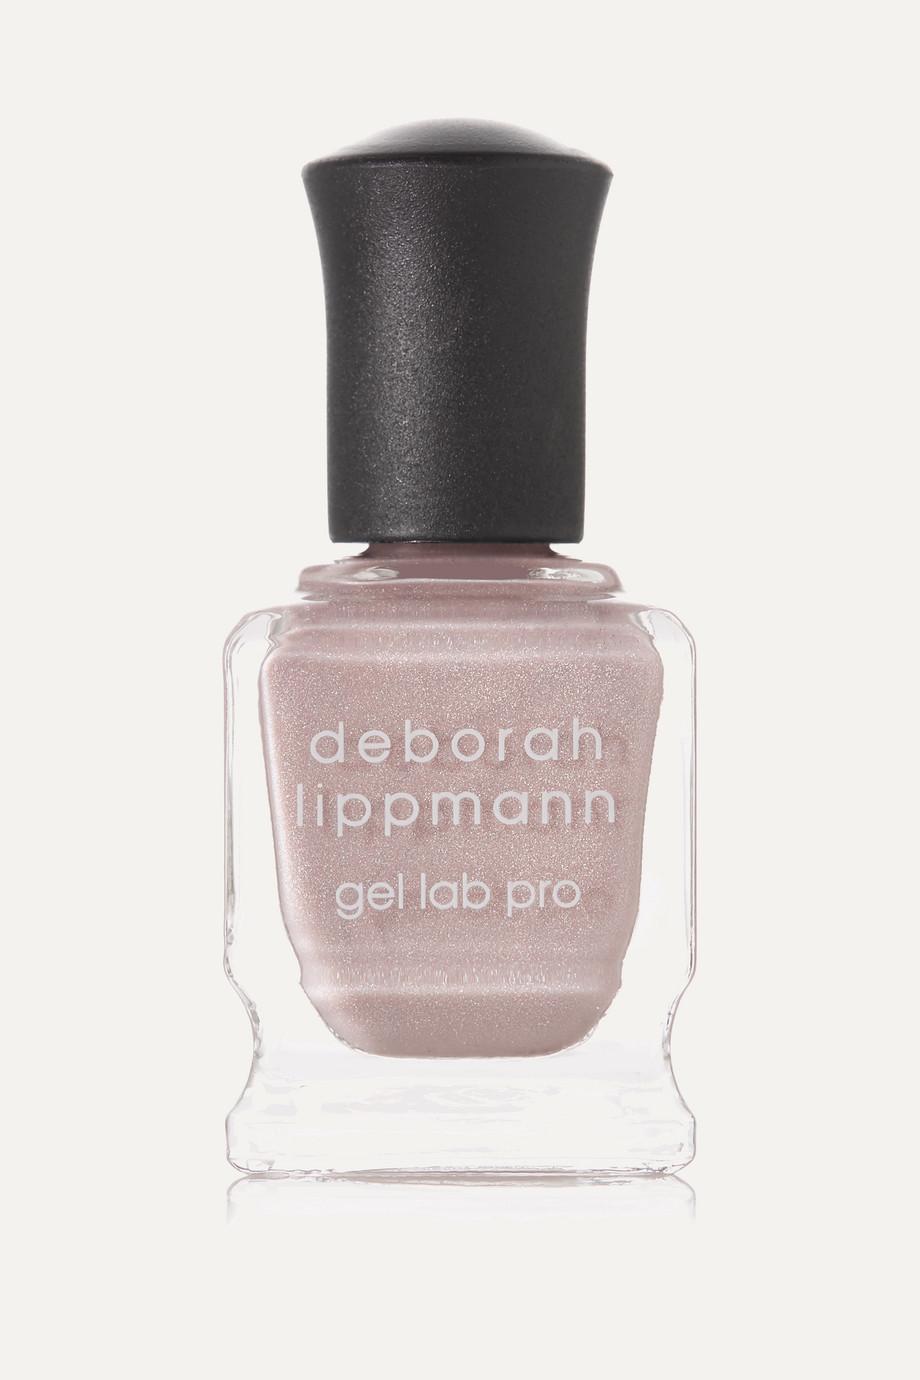 Deborah Lippmann Gel Lab Pro Nail Polish – Dirty Little Secret – Nagellack